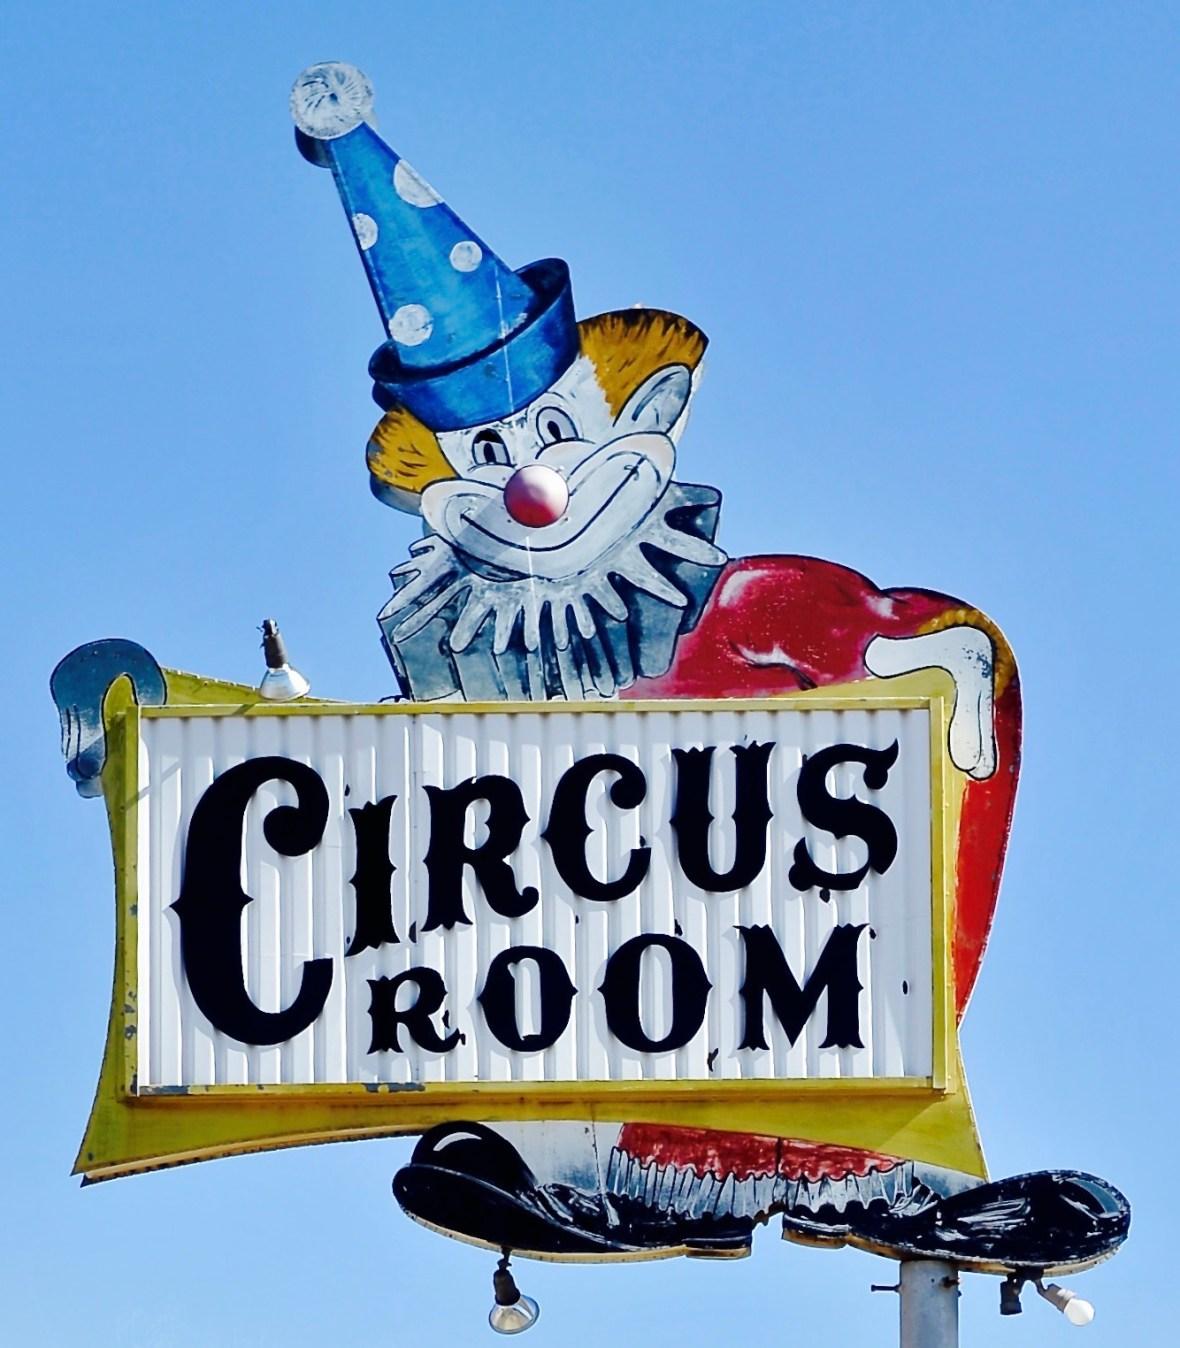 Circus Room - 2309 SW 6th Avenue, Amarillo, Texas U.S.A. - October 26, 2017